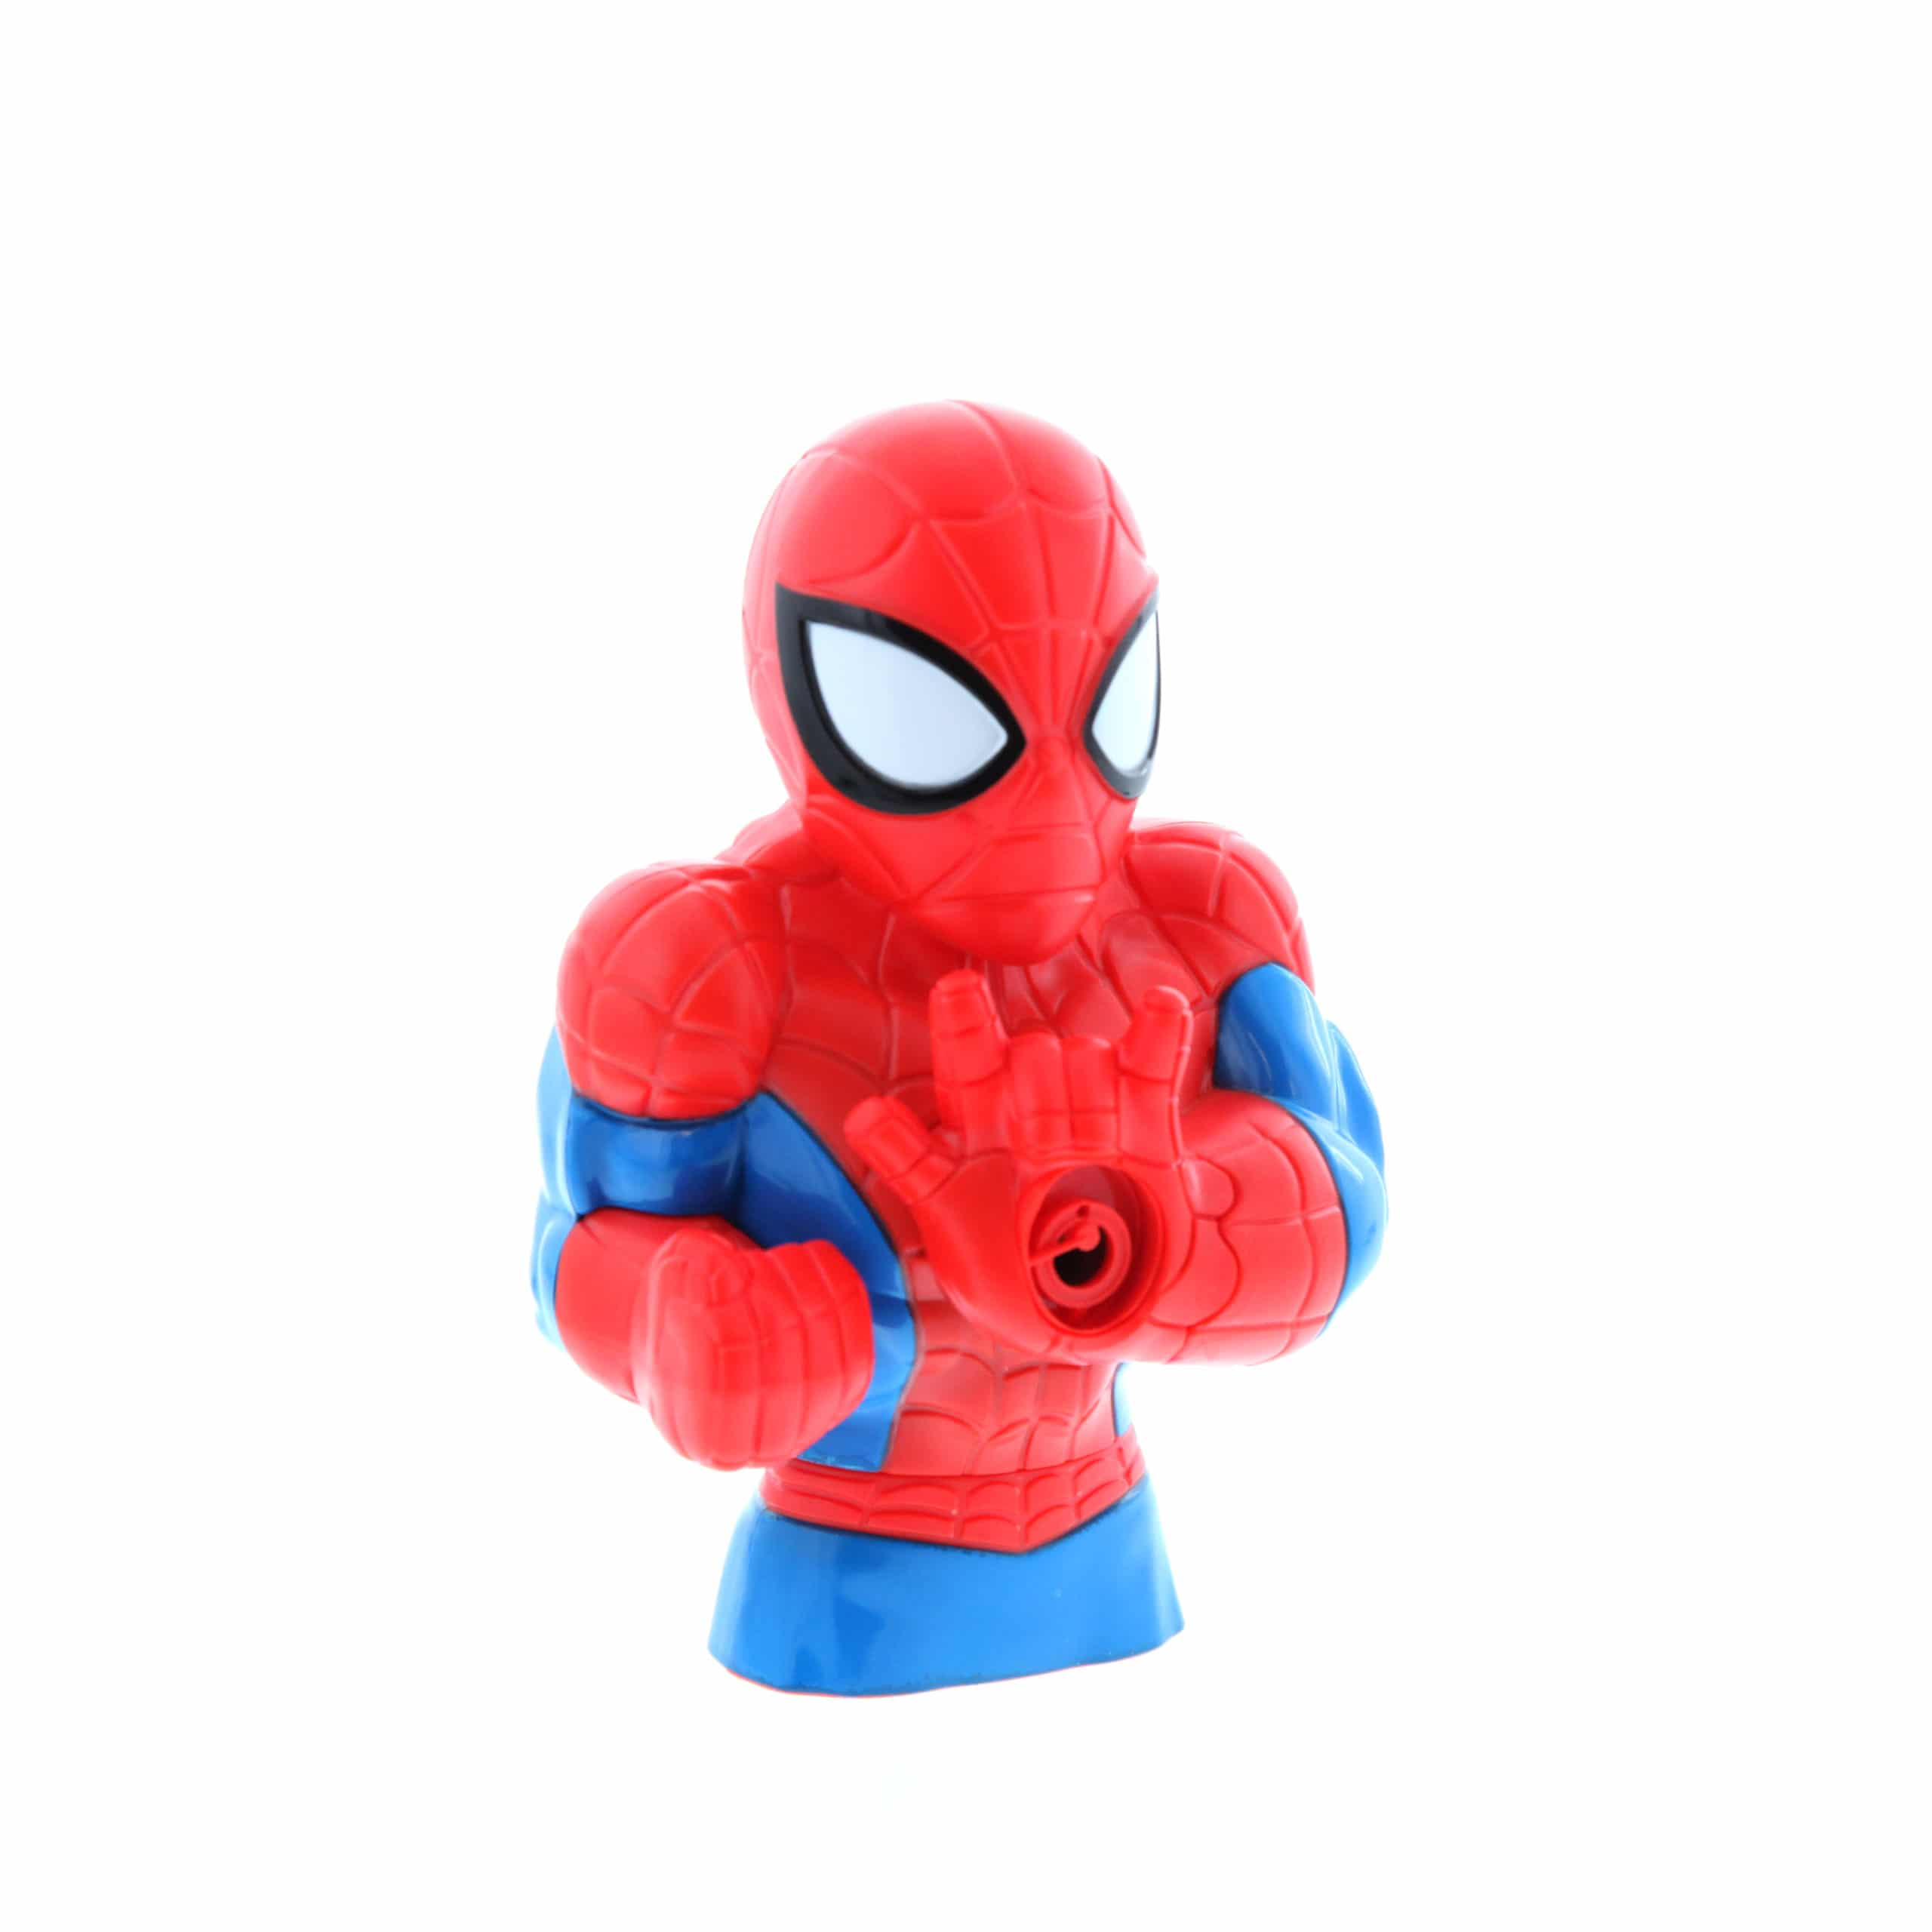 Spider-man Bubble Blower